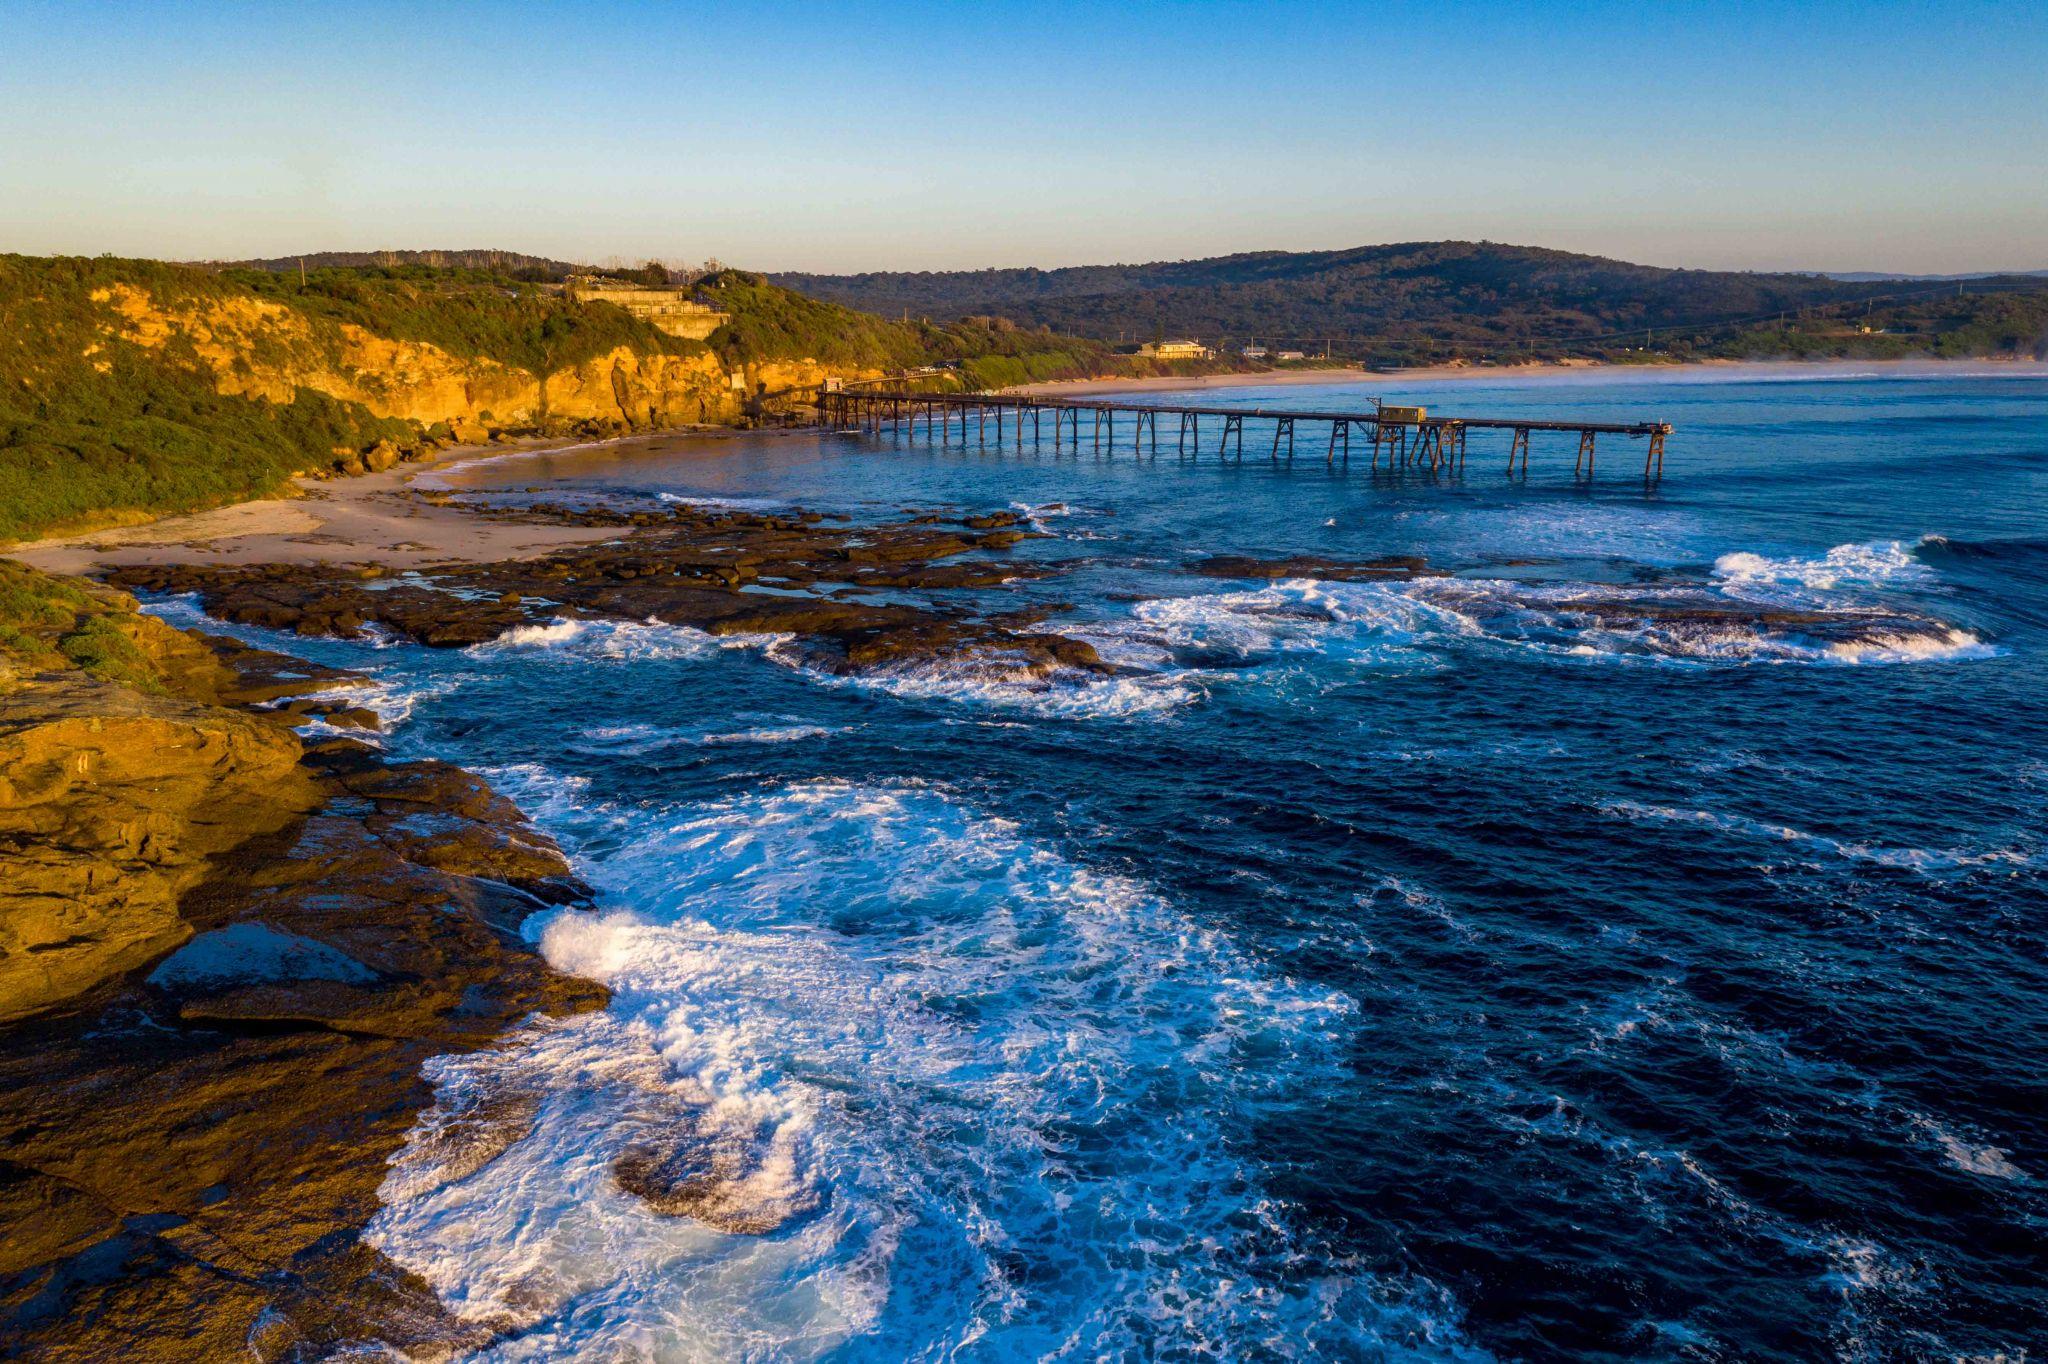 Catherine Hill Bay Jetty Drone Newcastle, Australia